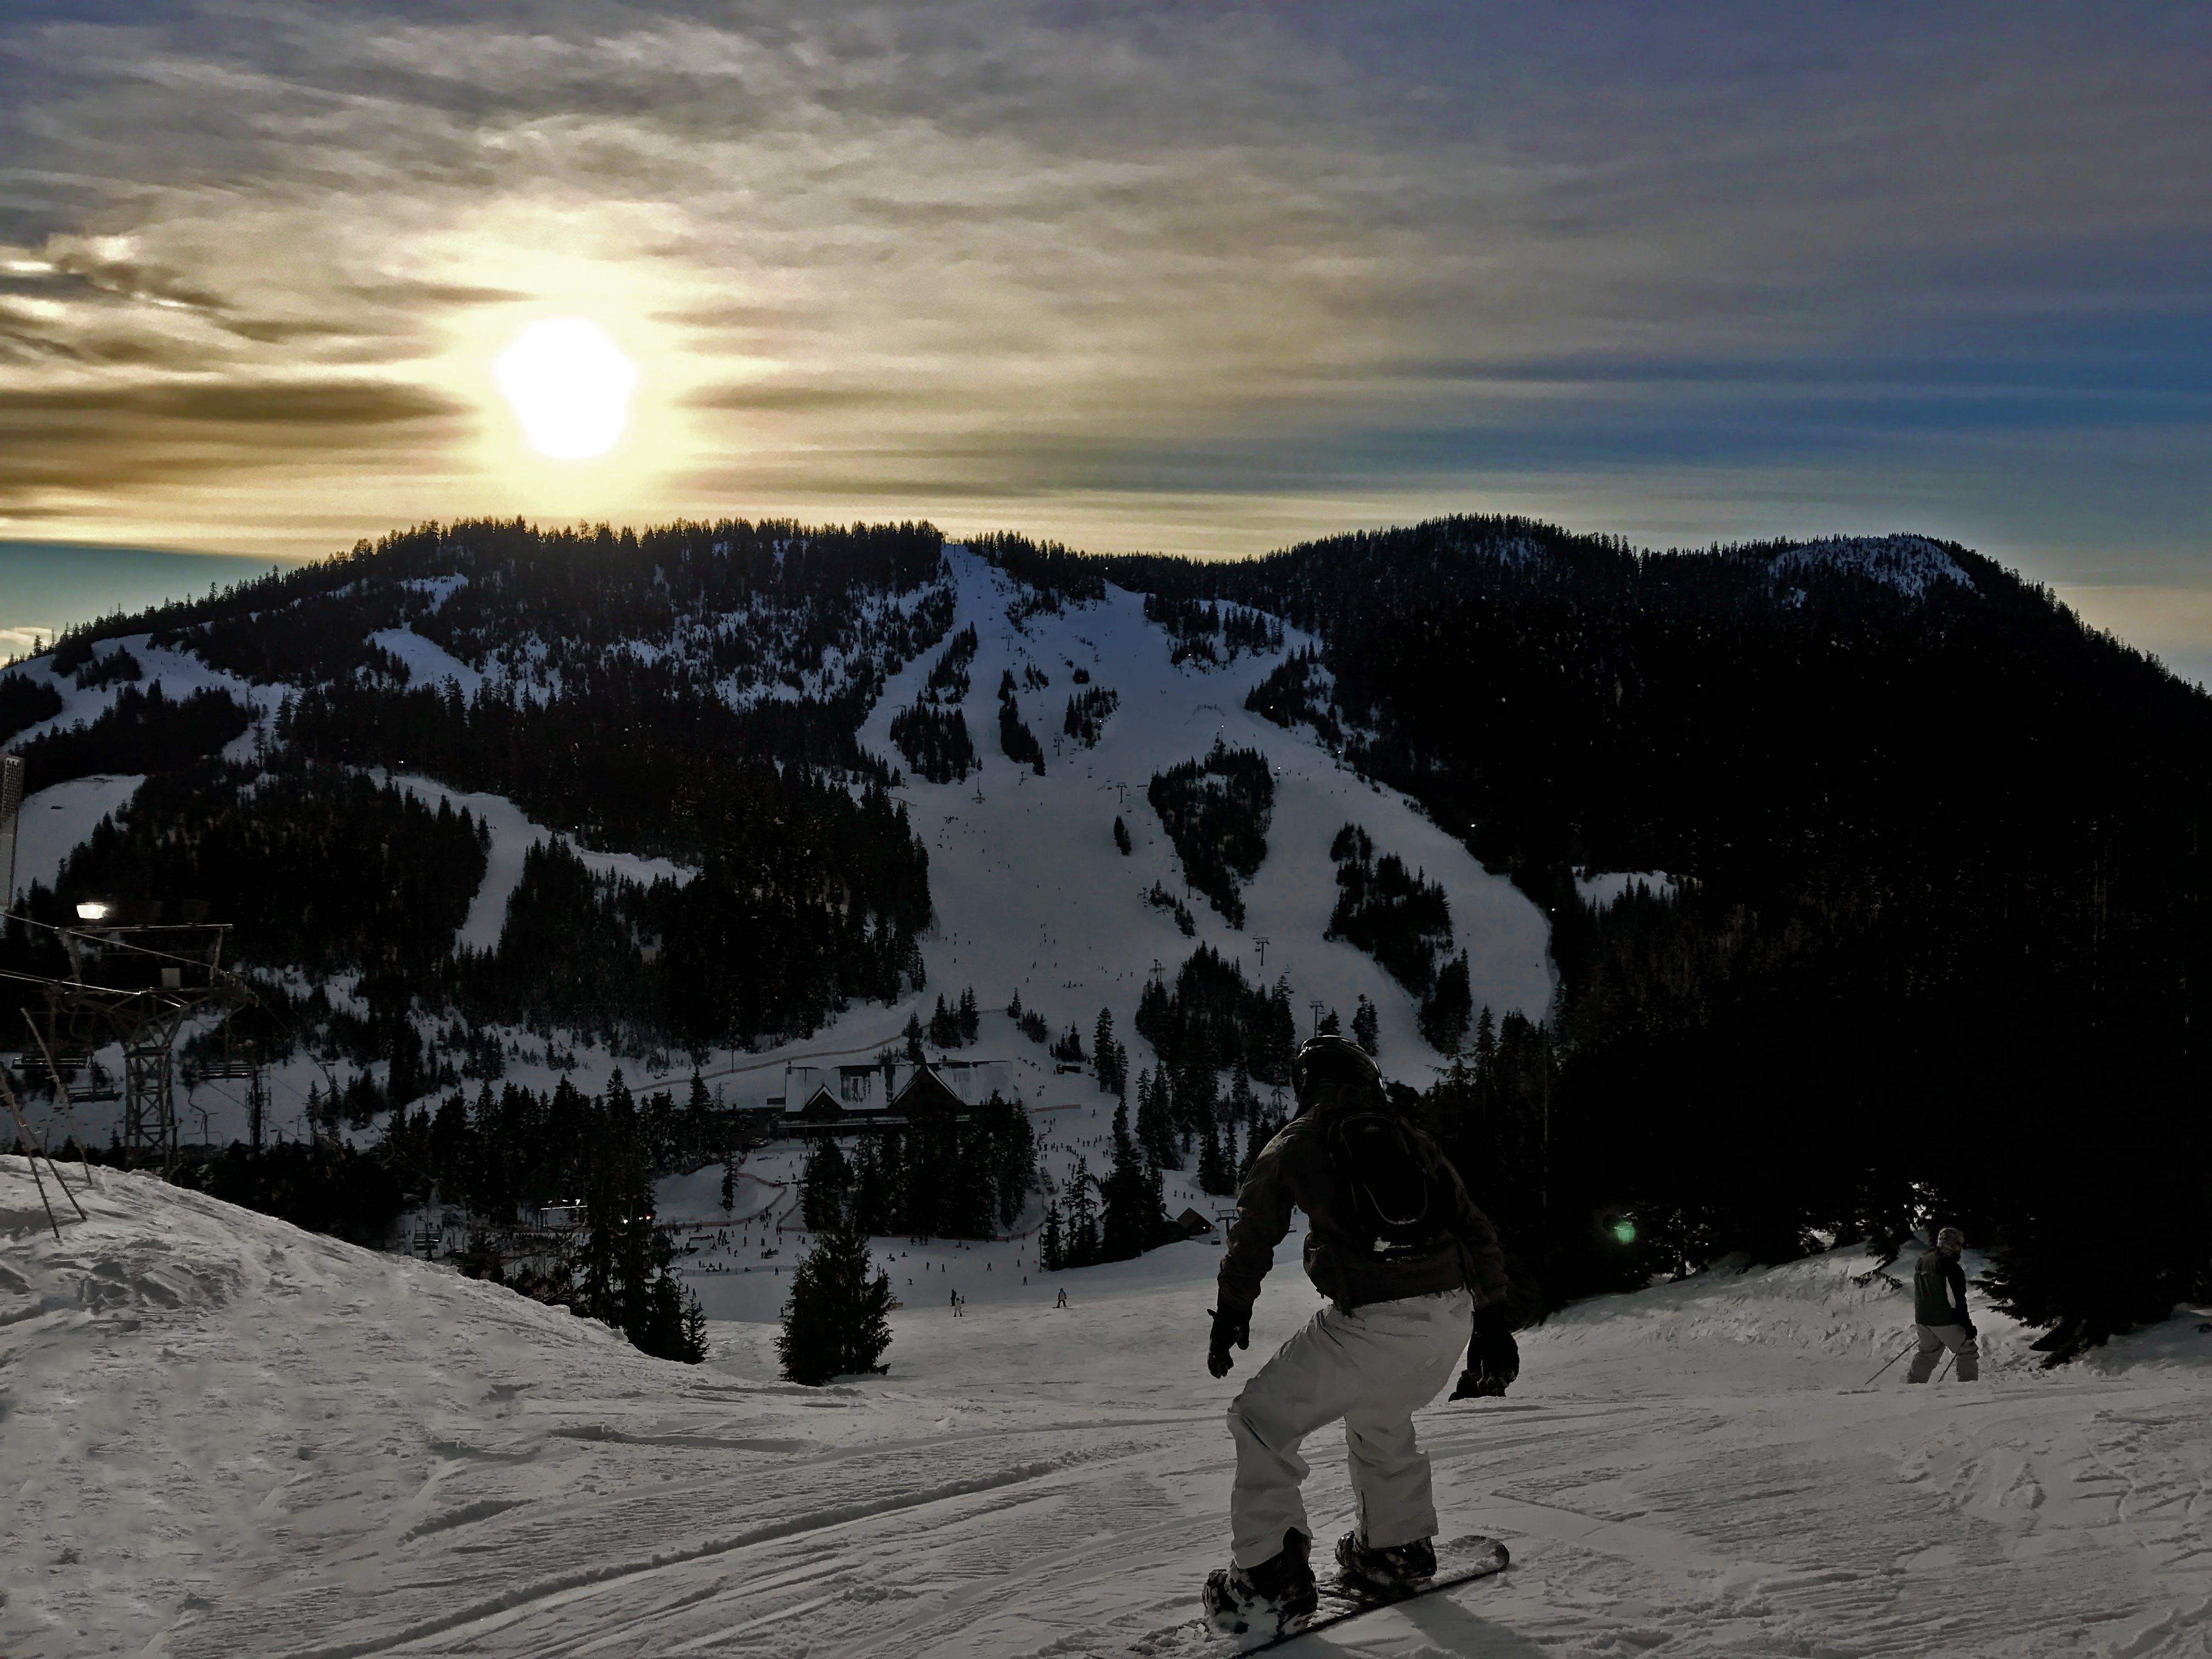 Gratis lagerfoto af bjerg, Ski, sne, snowboard